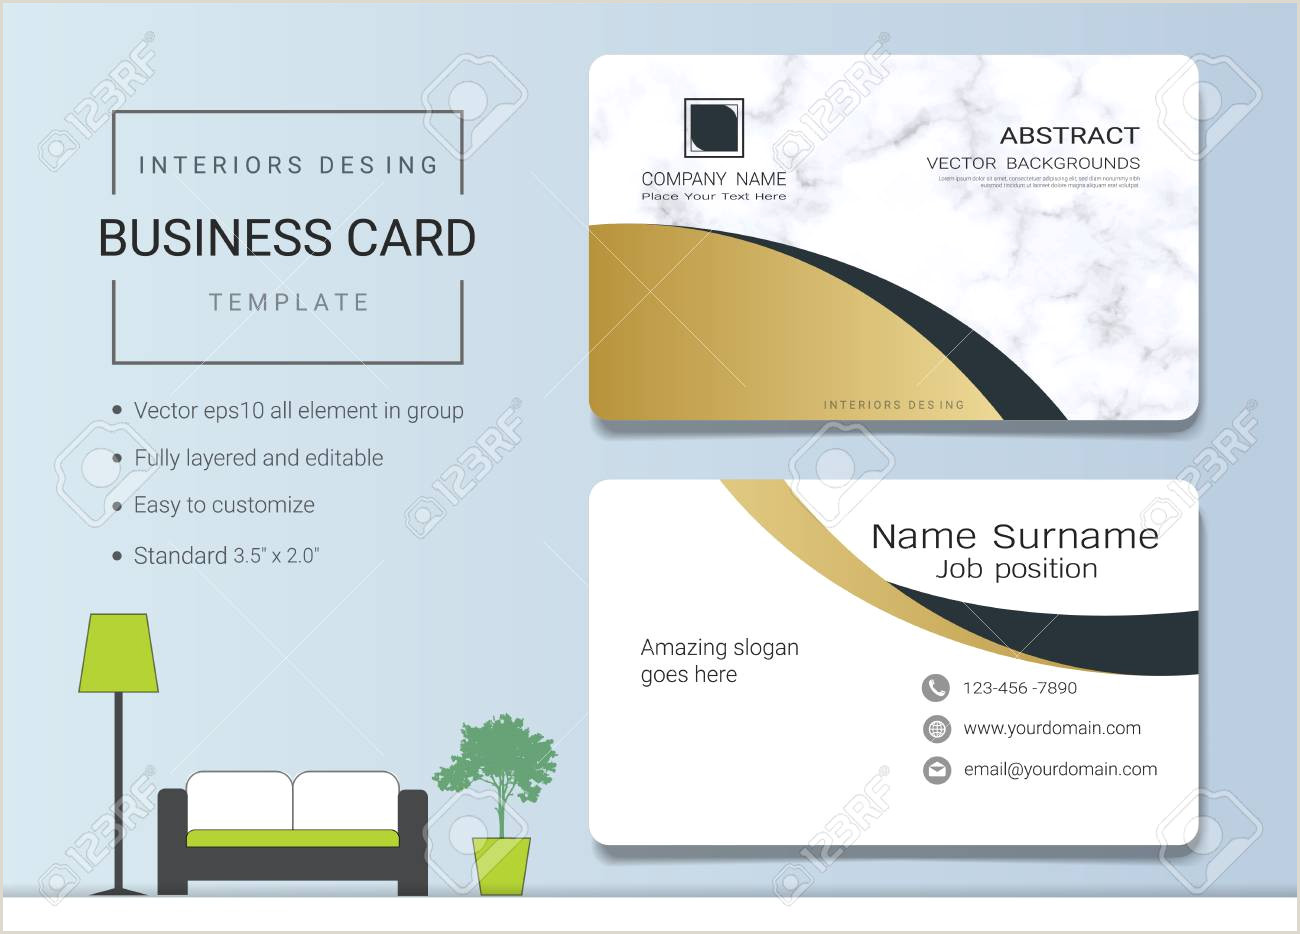 Unique Business Cards For Interior Designers Business Cards For Interior Designers